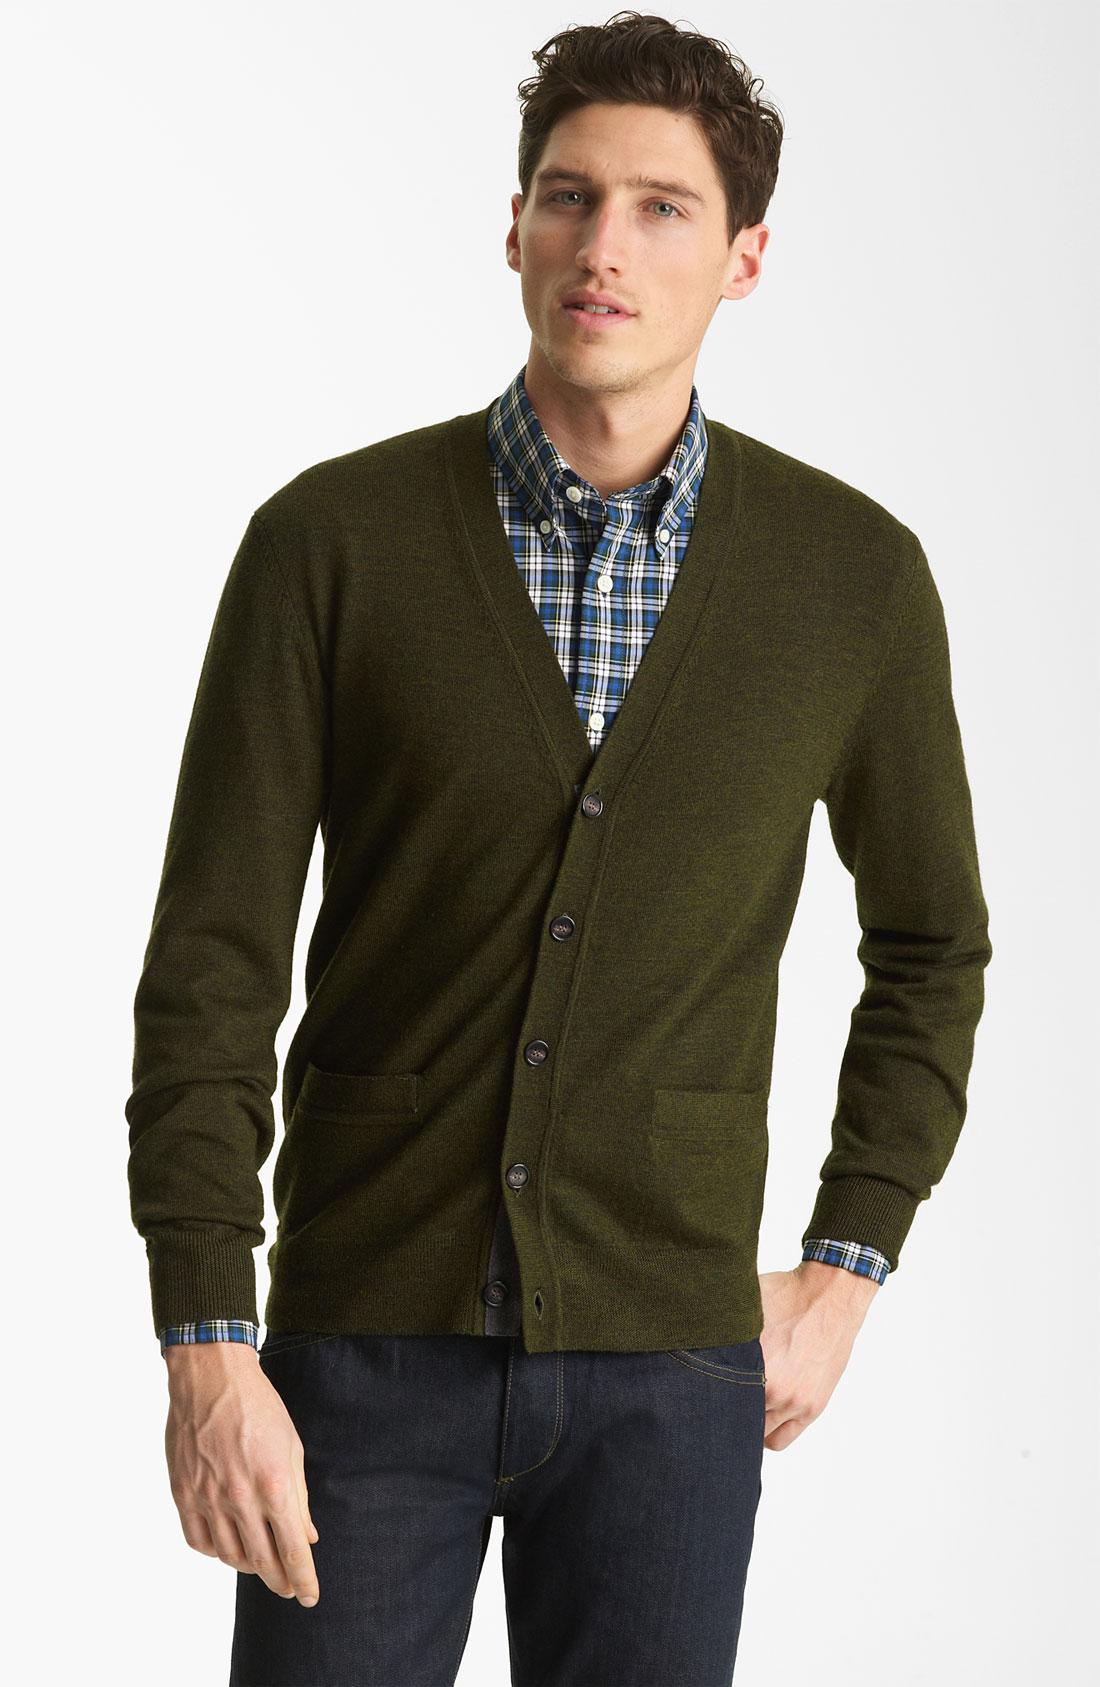 Green Cardigan Mens - English Sweater Vest